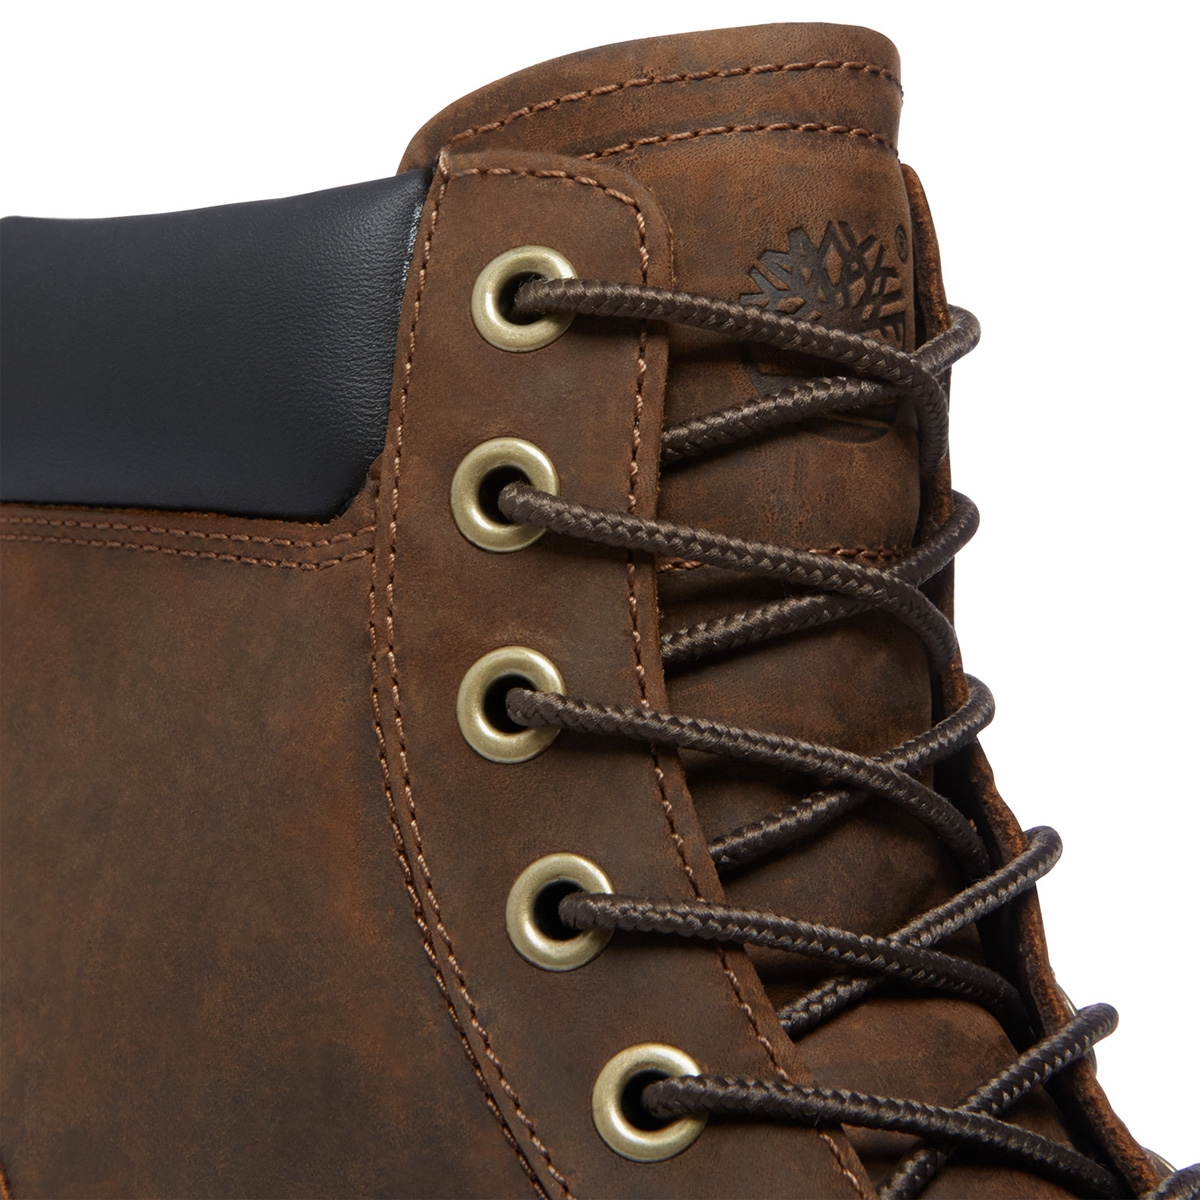 Timberland Men's Earthkeepers® Rugged 6 Inch Plain Toe Waterproof Boot Dark Brown (Model A11M6)